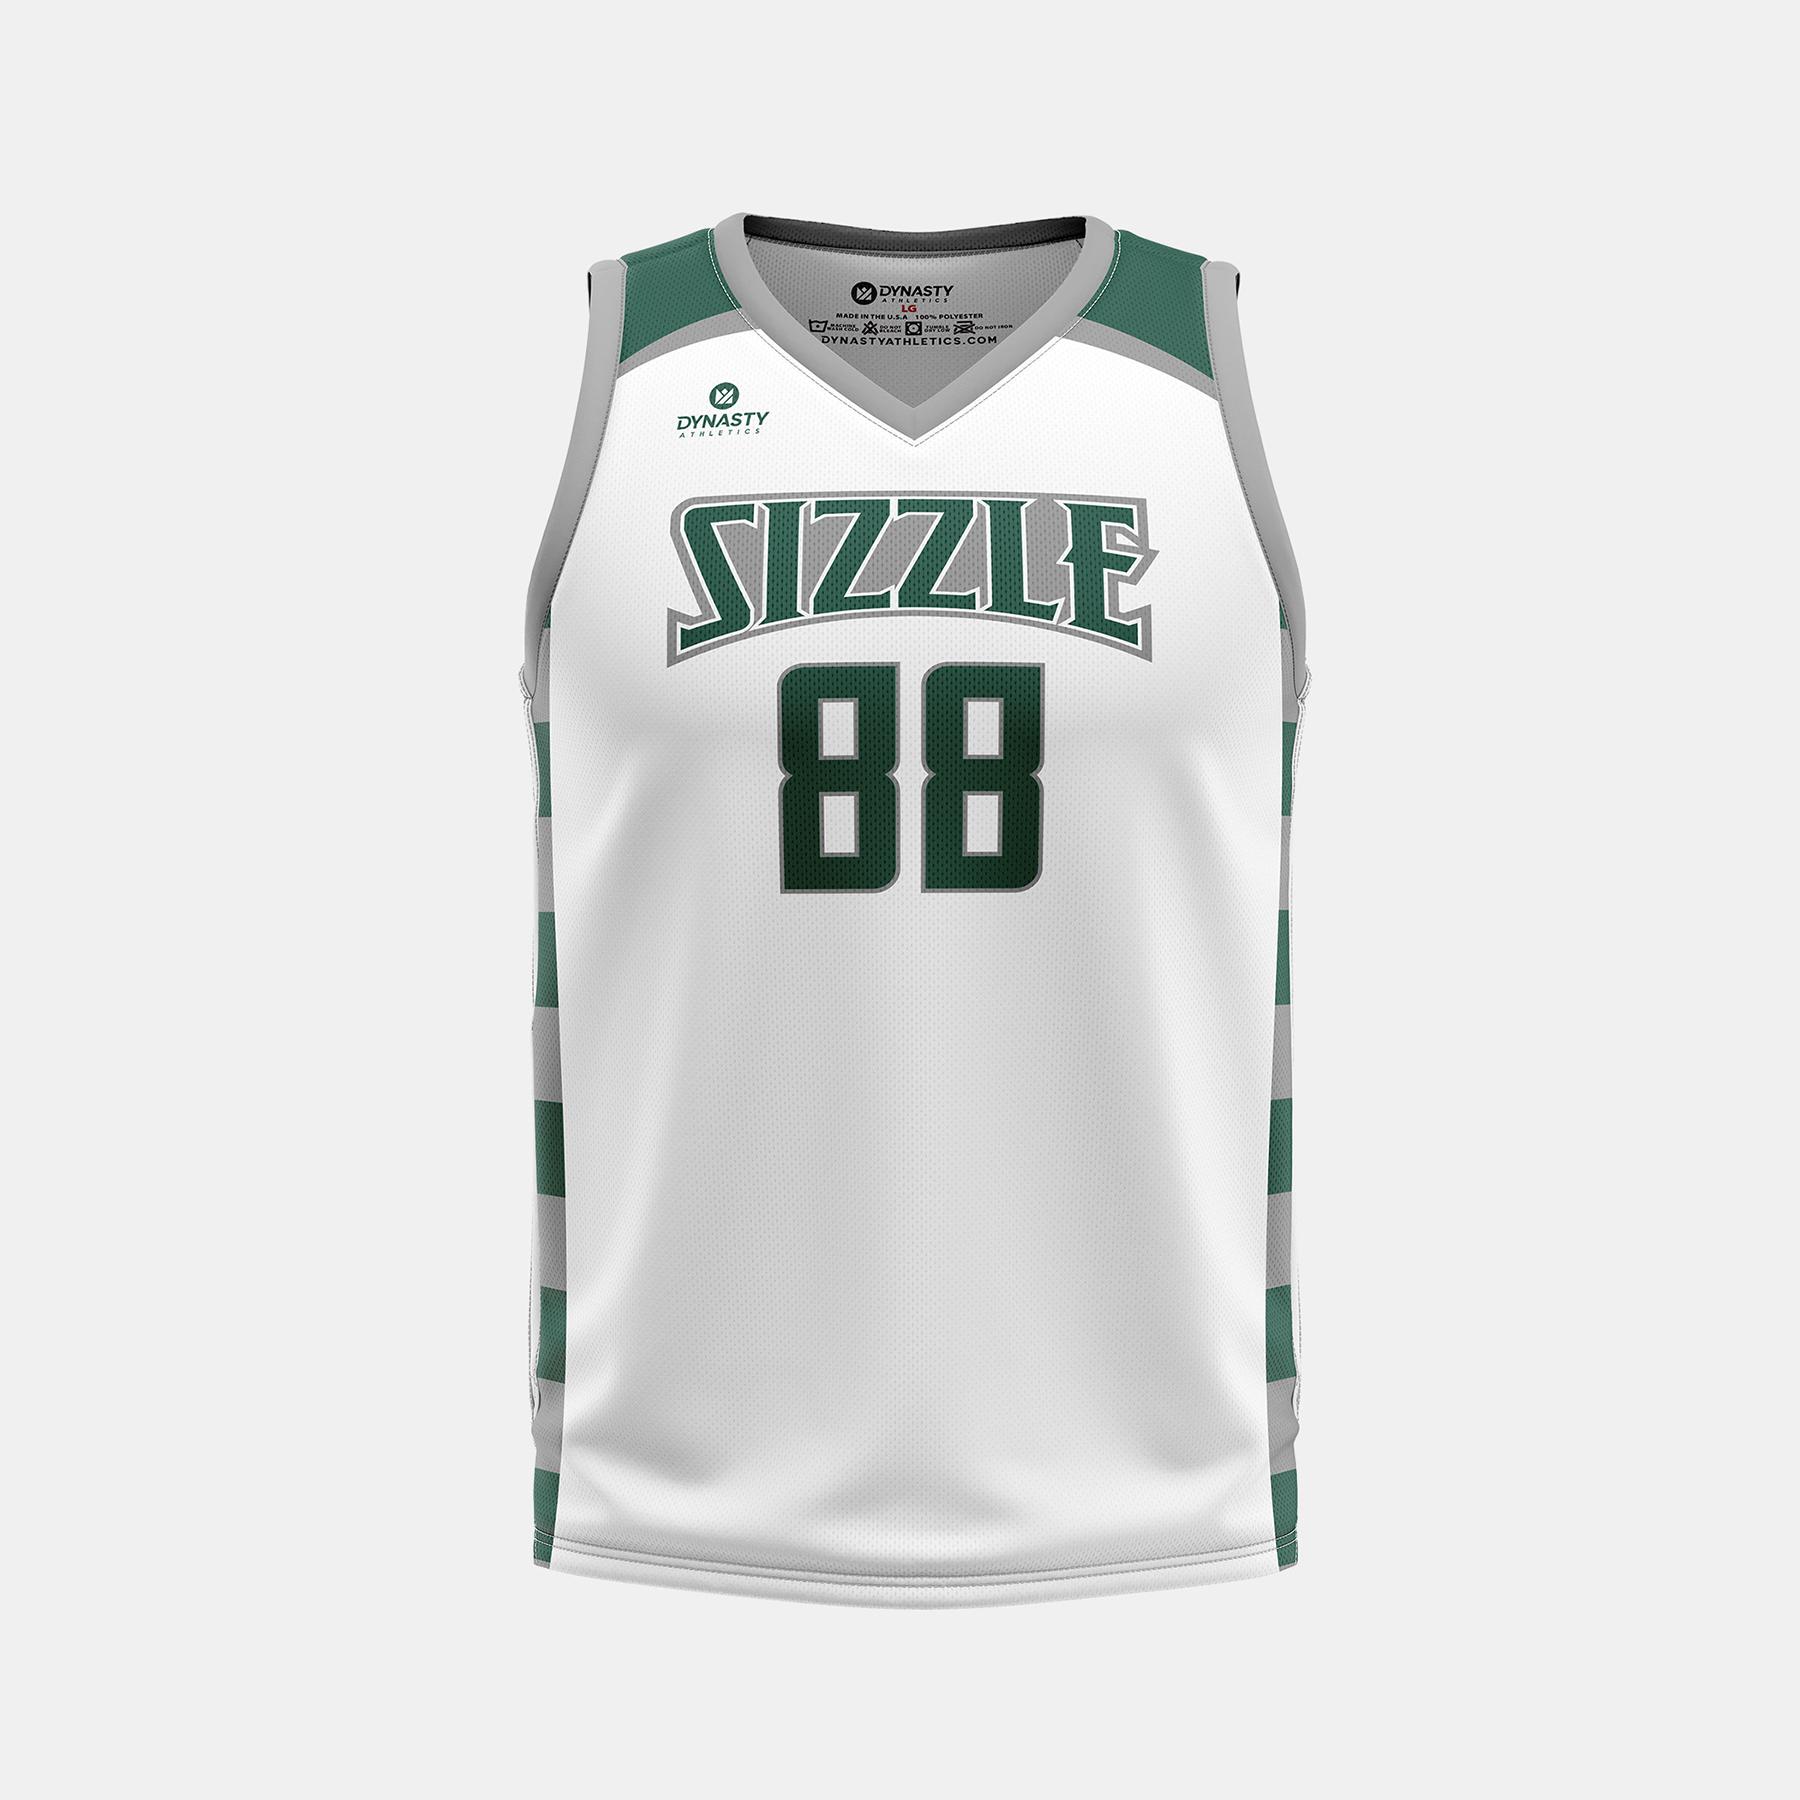 Dynasty Athletics Sizzle VNeck Basketball Jersey Away Front